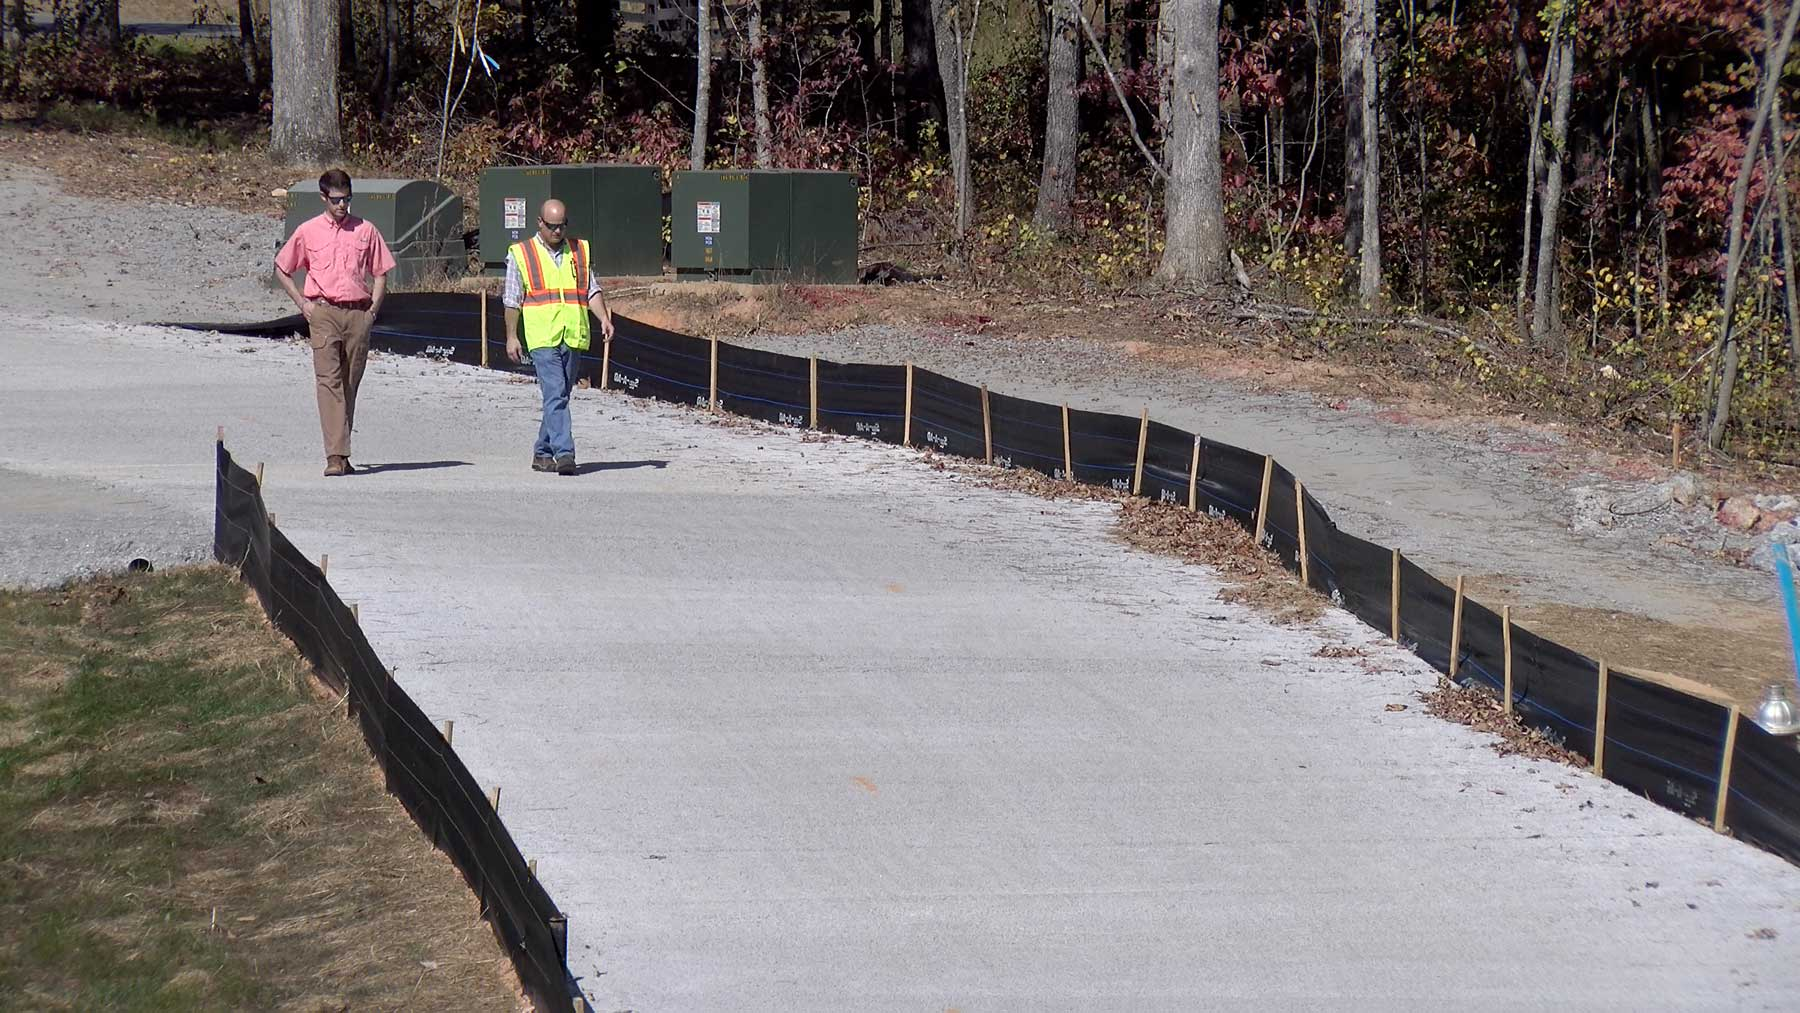 Pervious Concrete Mix Designs : Pervious concrete pavements help reduce stormwater runoff